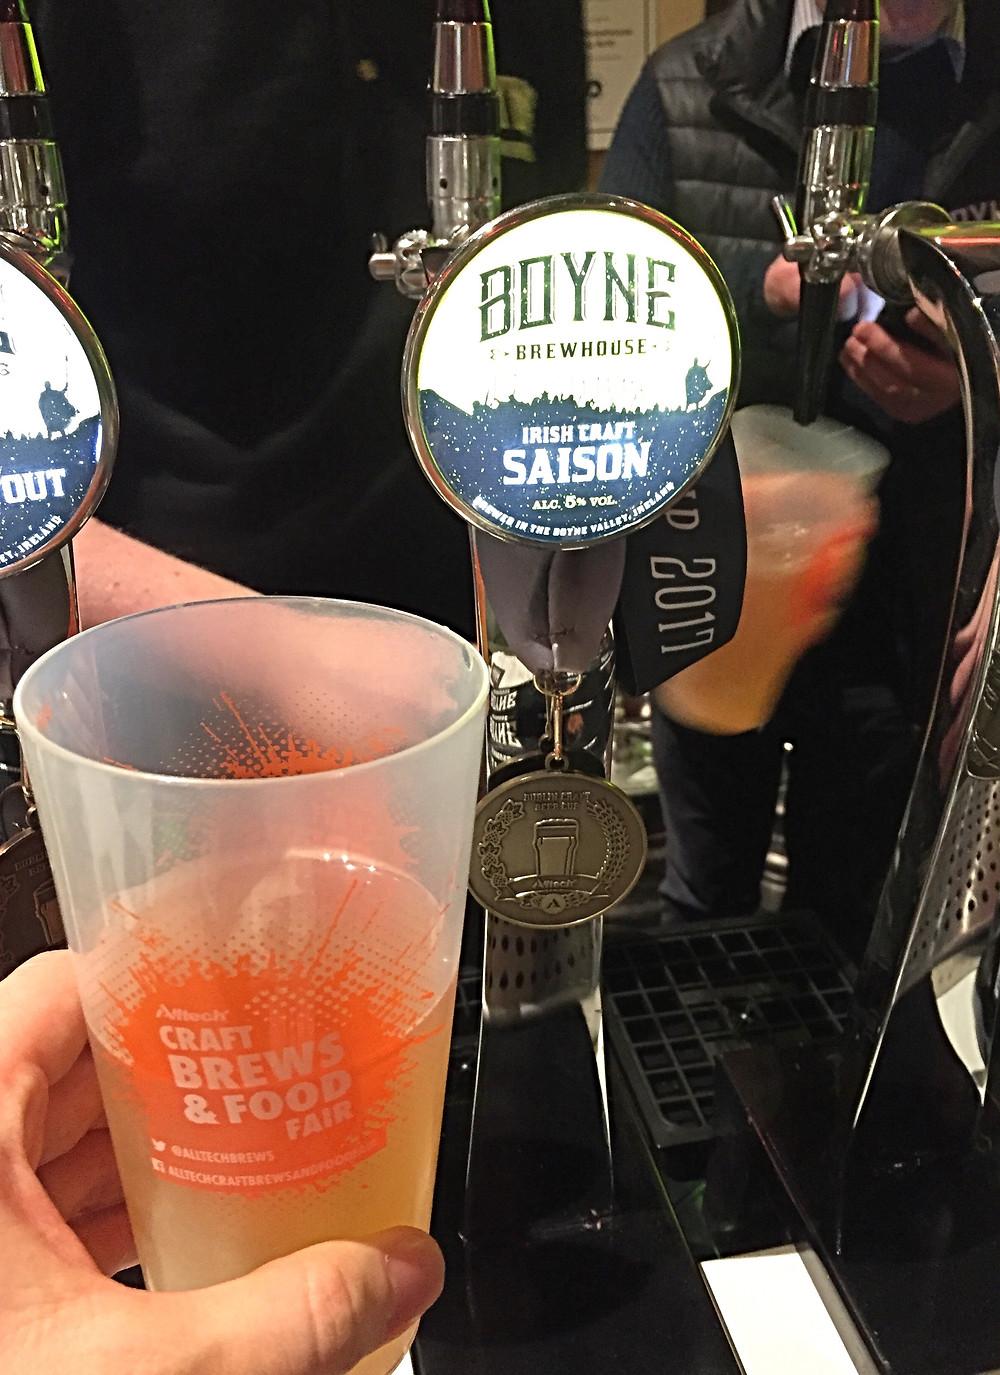 Alltech Craft Beer Festival - Boyne Brewhouse